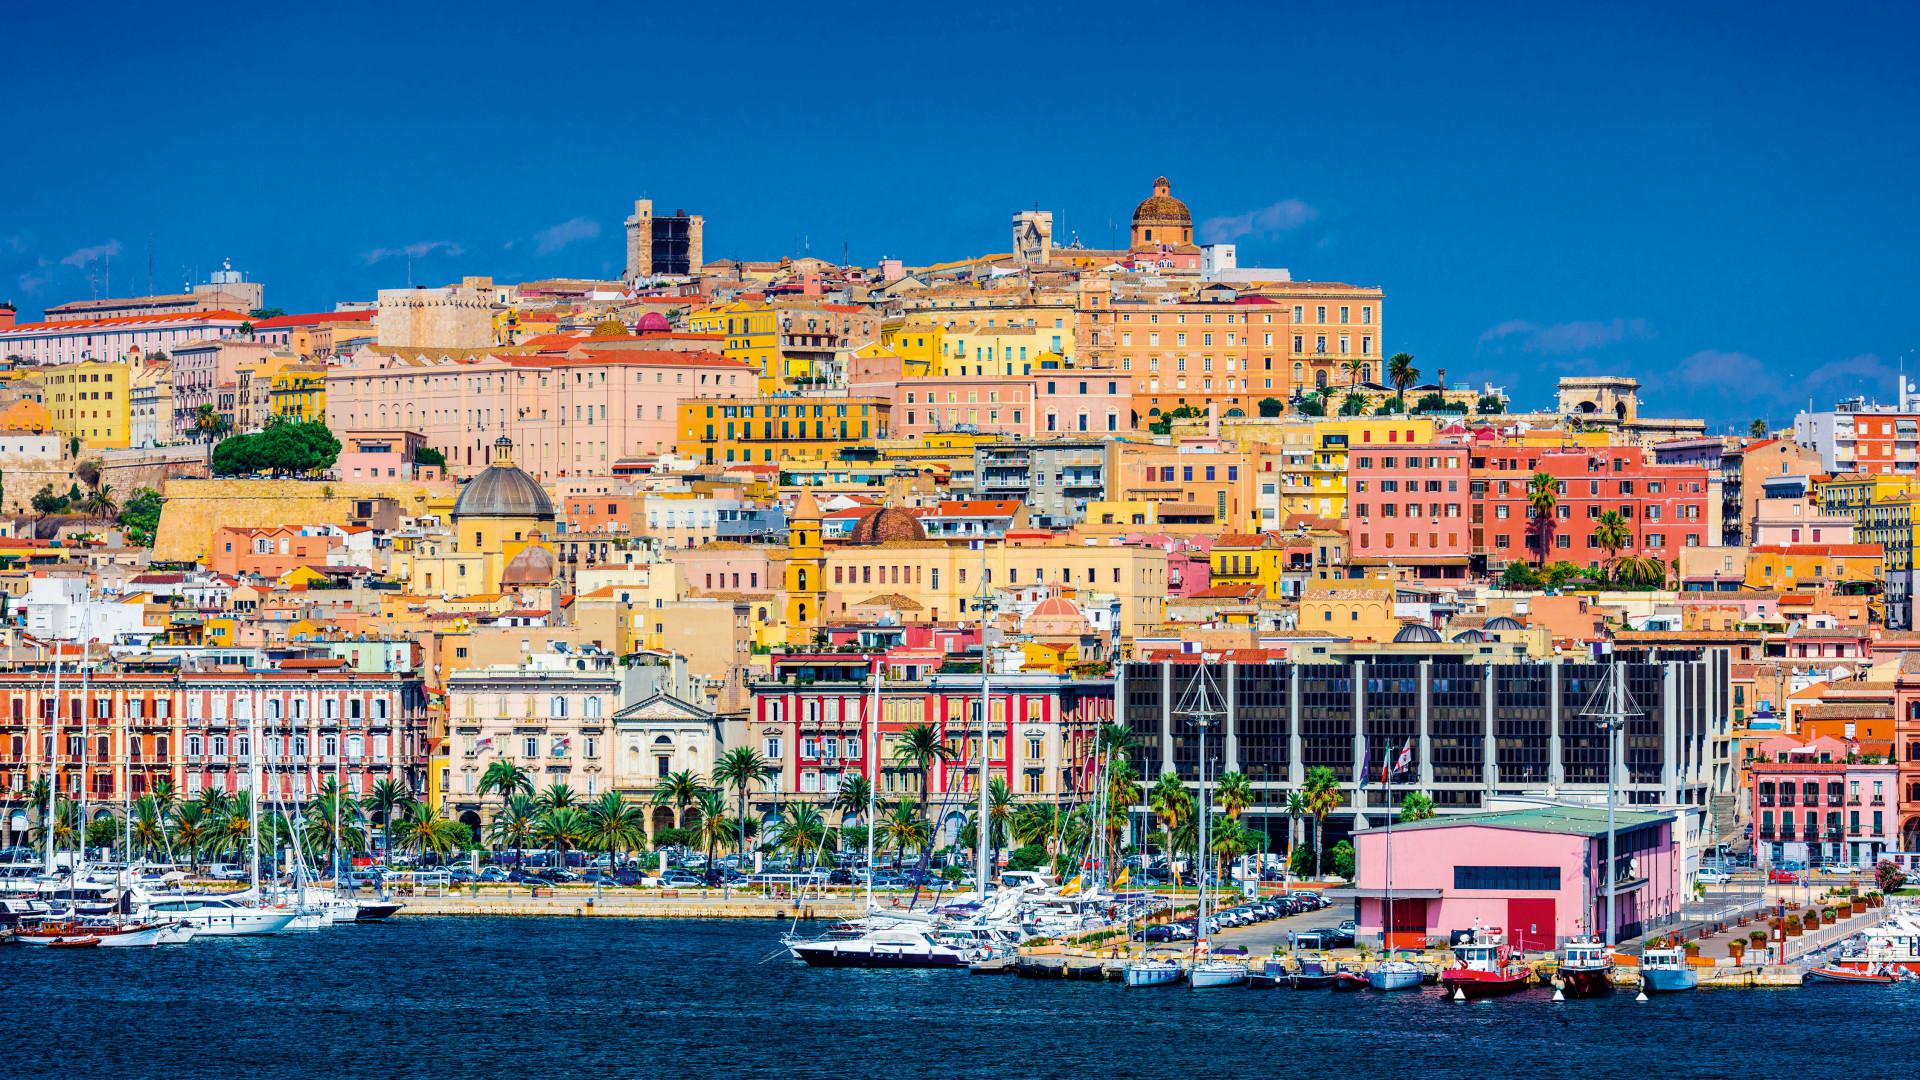 The colourful Sardinian coastline